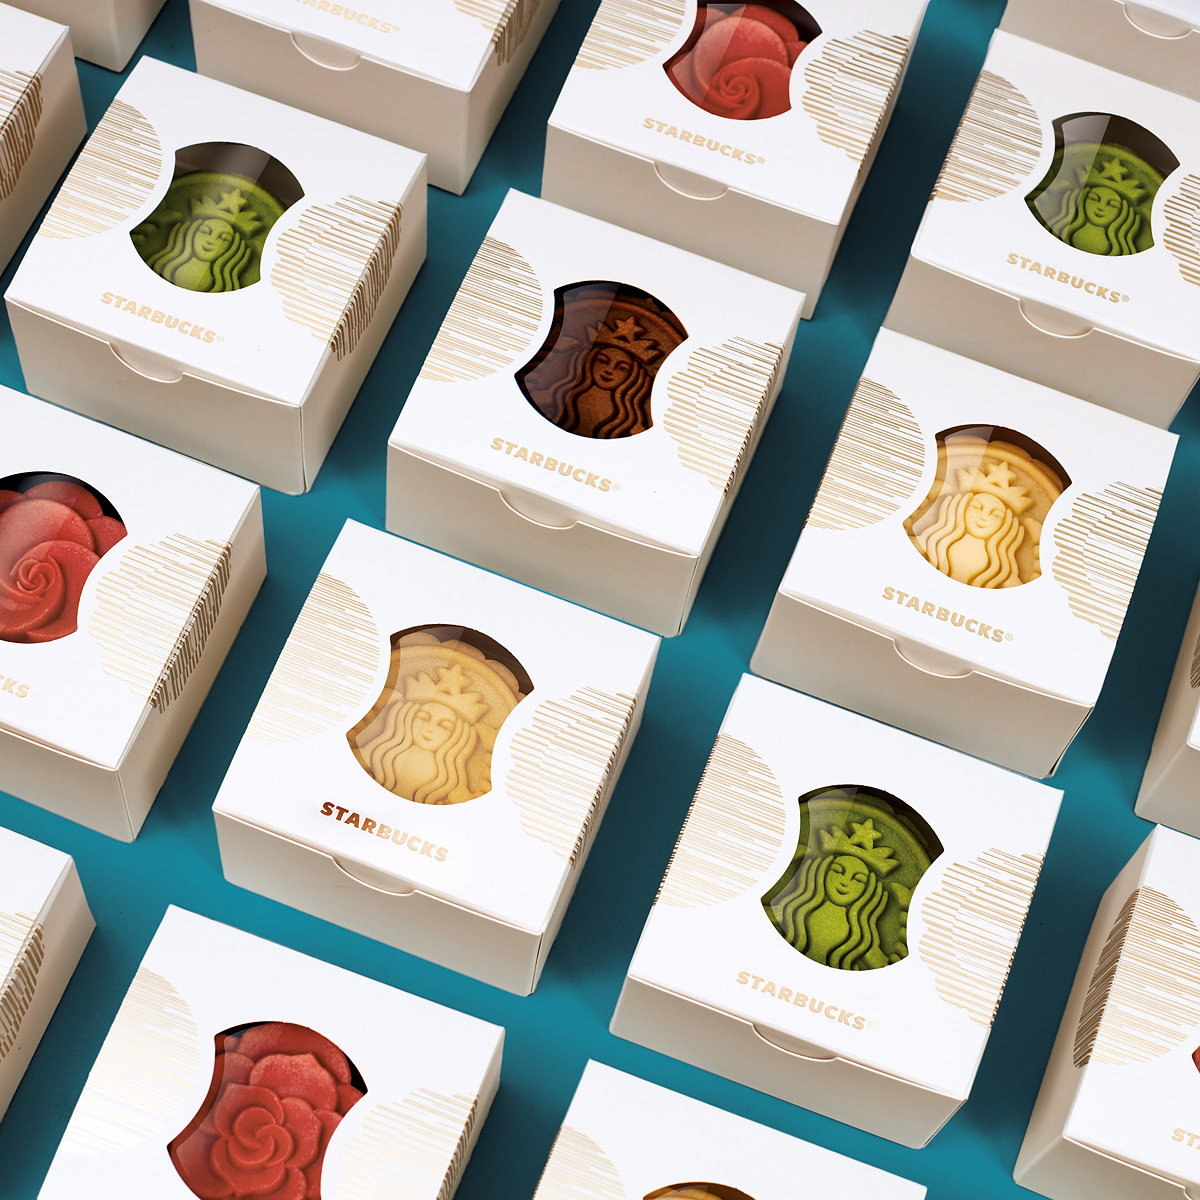 Design Bridge Shanghai Creates Disruptive For Starbucks Mooncakes Dilznoofus39s Tessellation Book